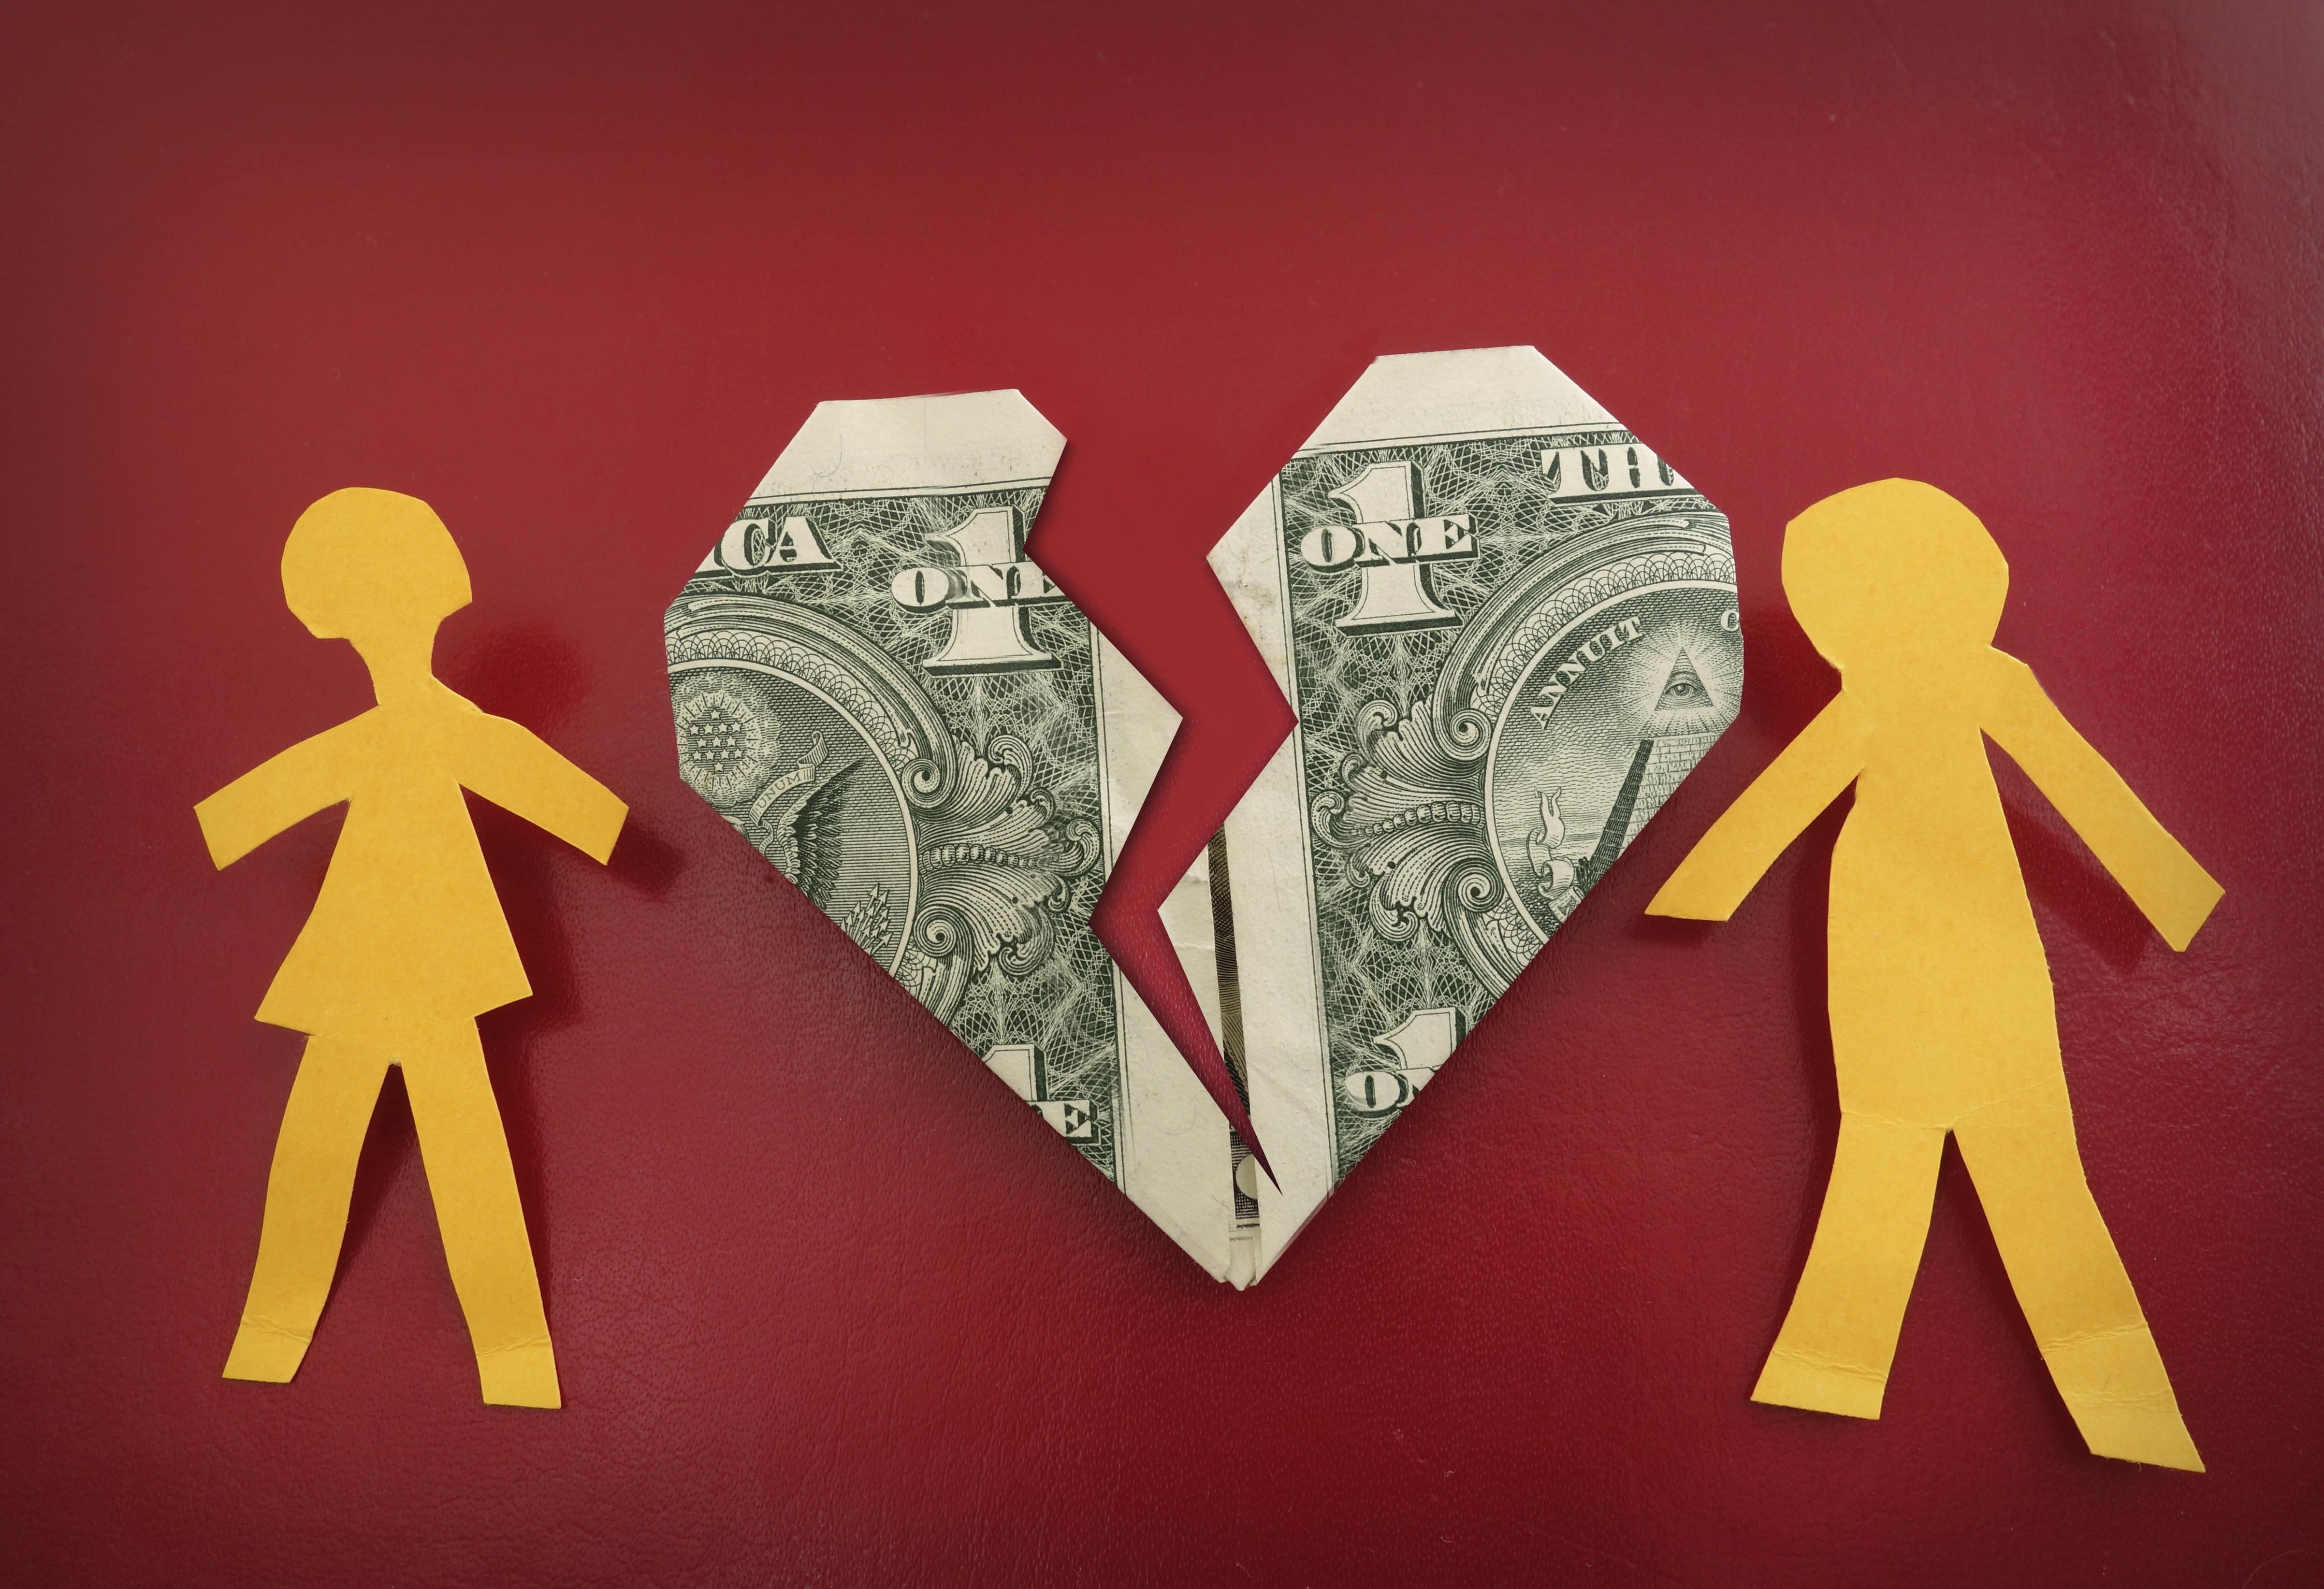 Money personals Flirty9 - Free online flirt and dating community